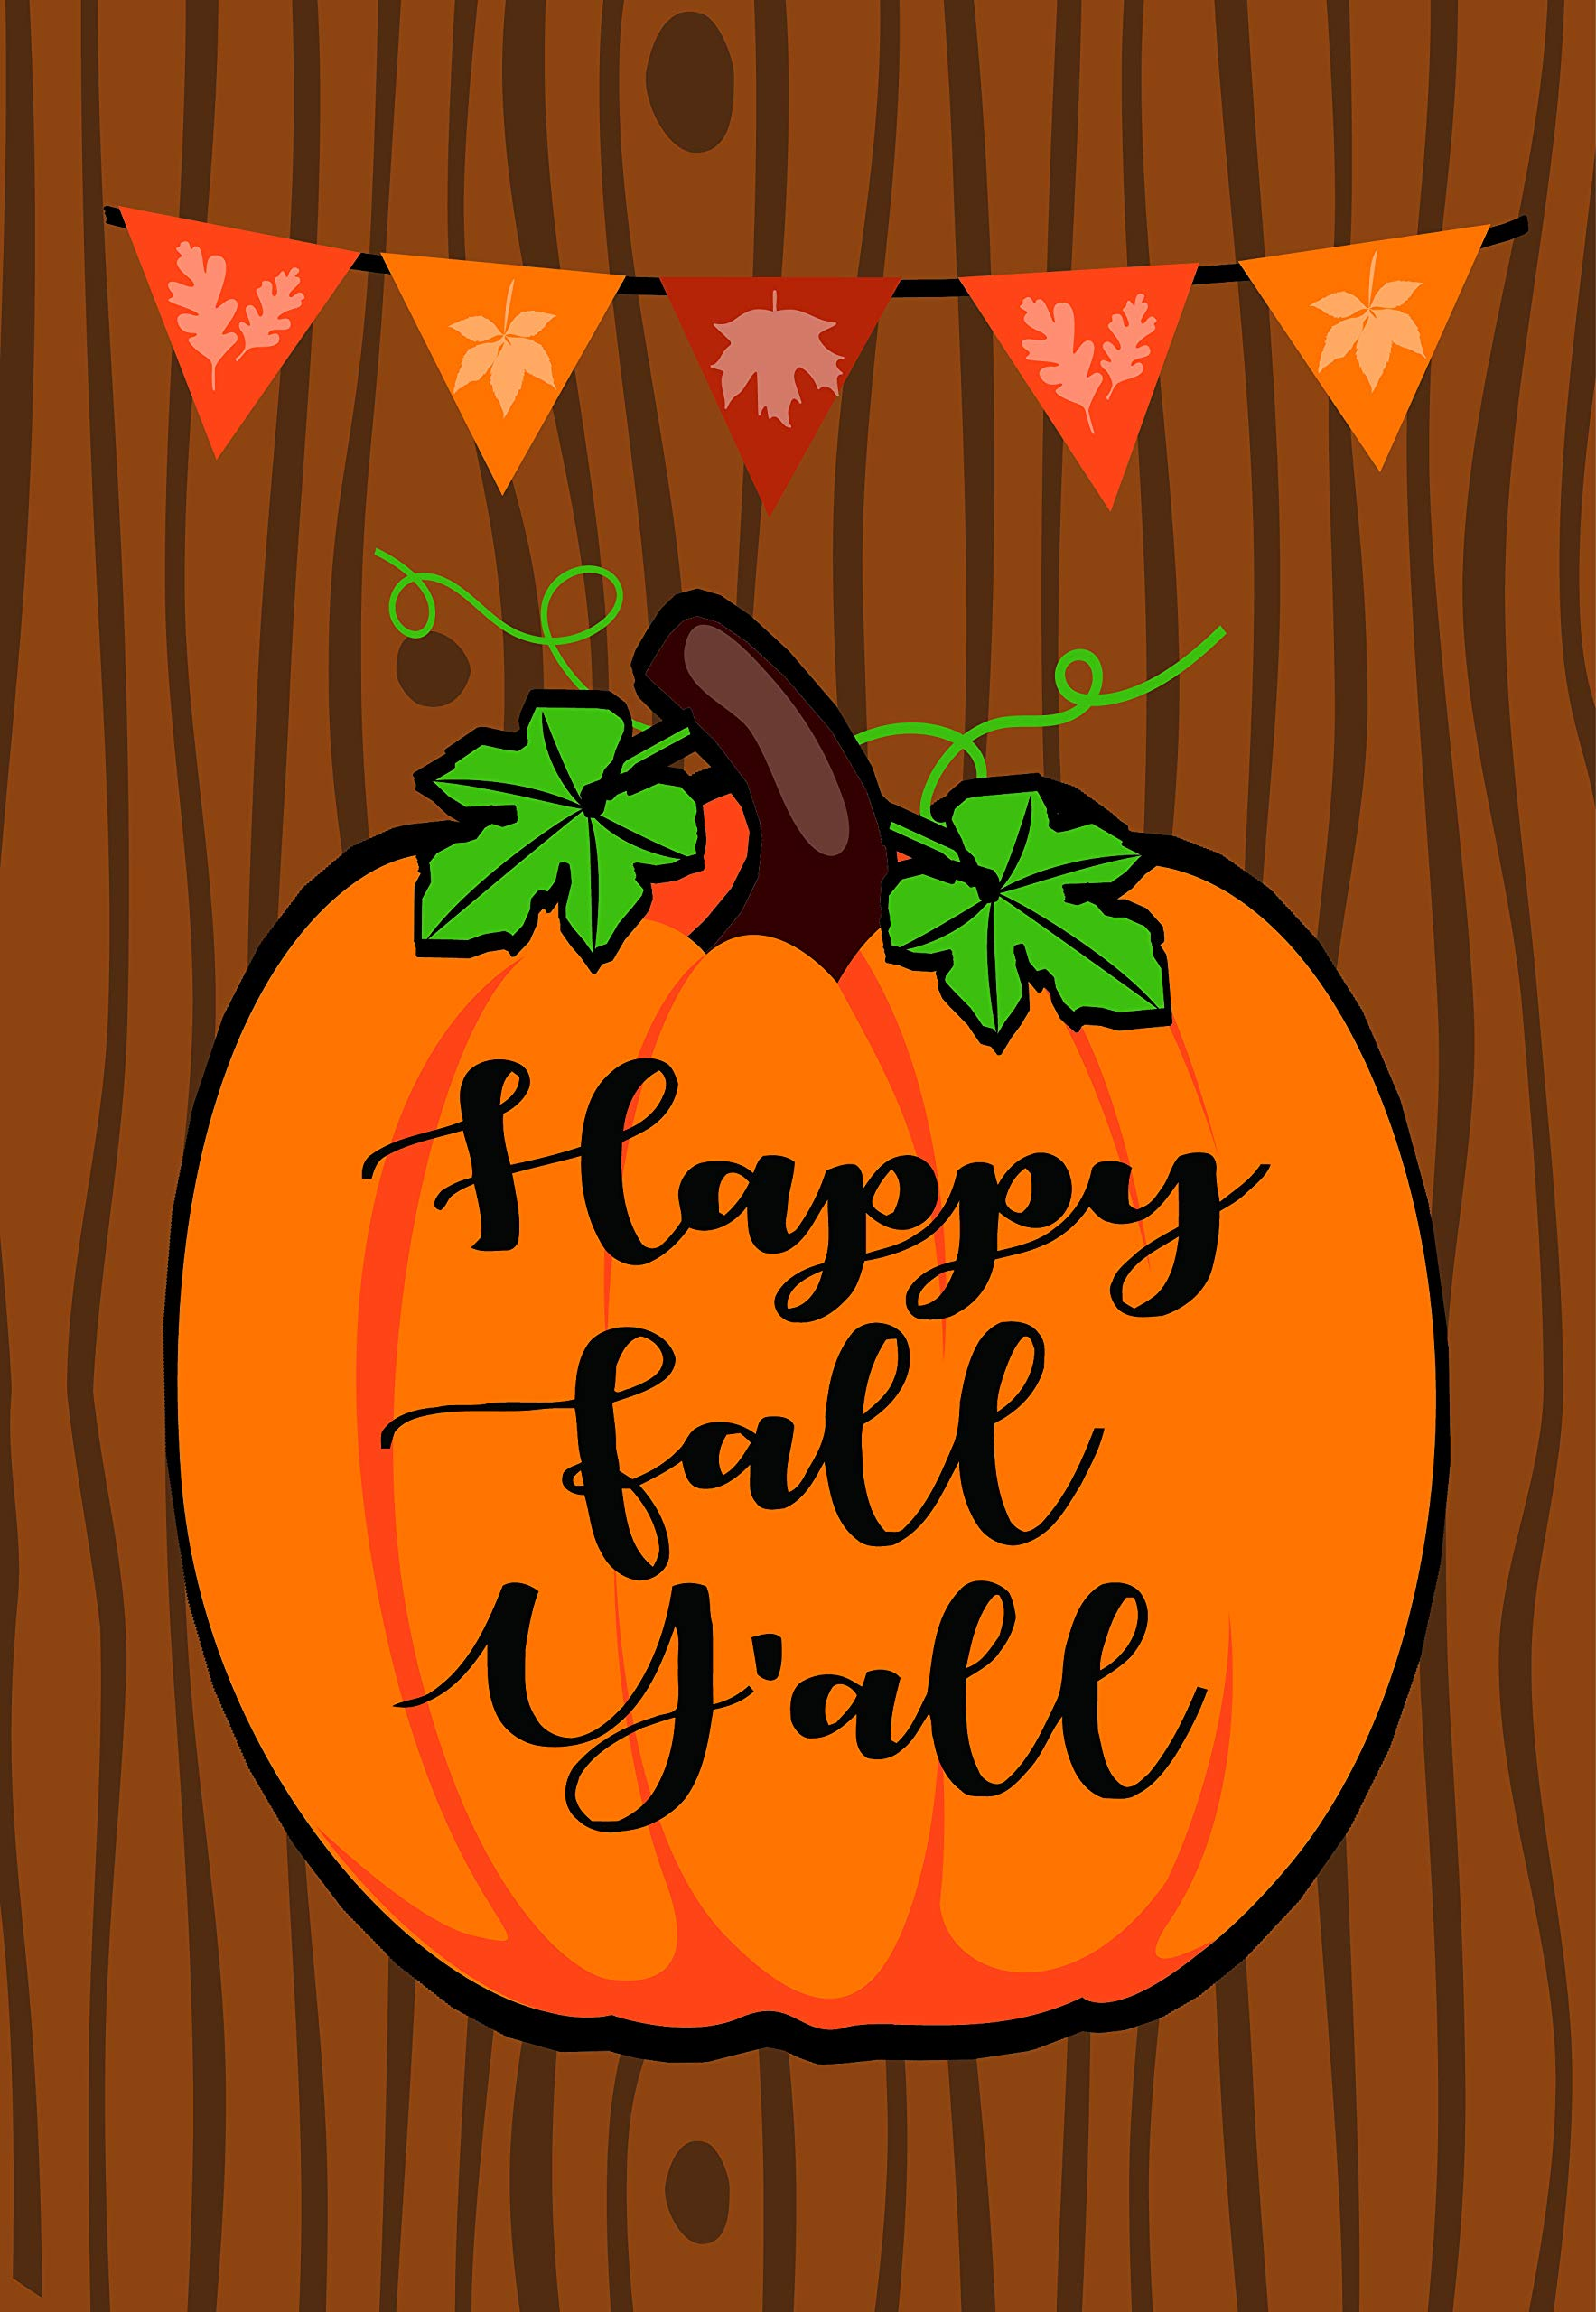 Lantern Hill Happy Fall Y'All Pumpkin House Flag; Double Sided; 28 x 40 inches; Seasonal Decorative Banner